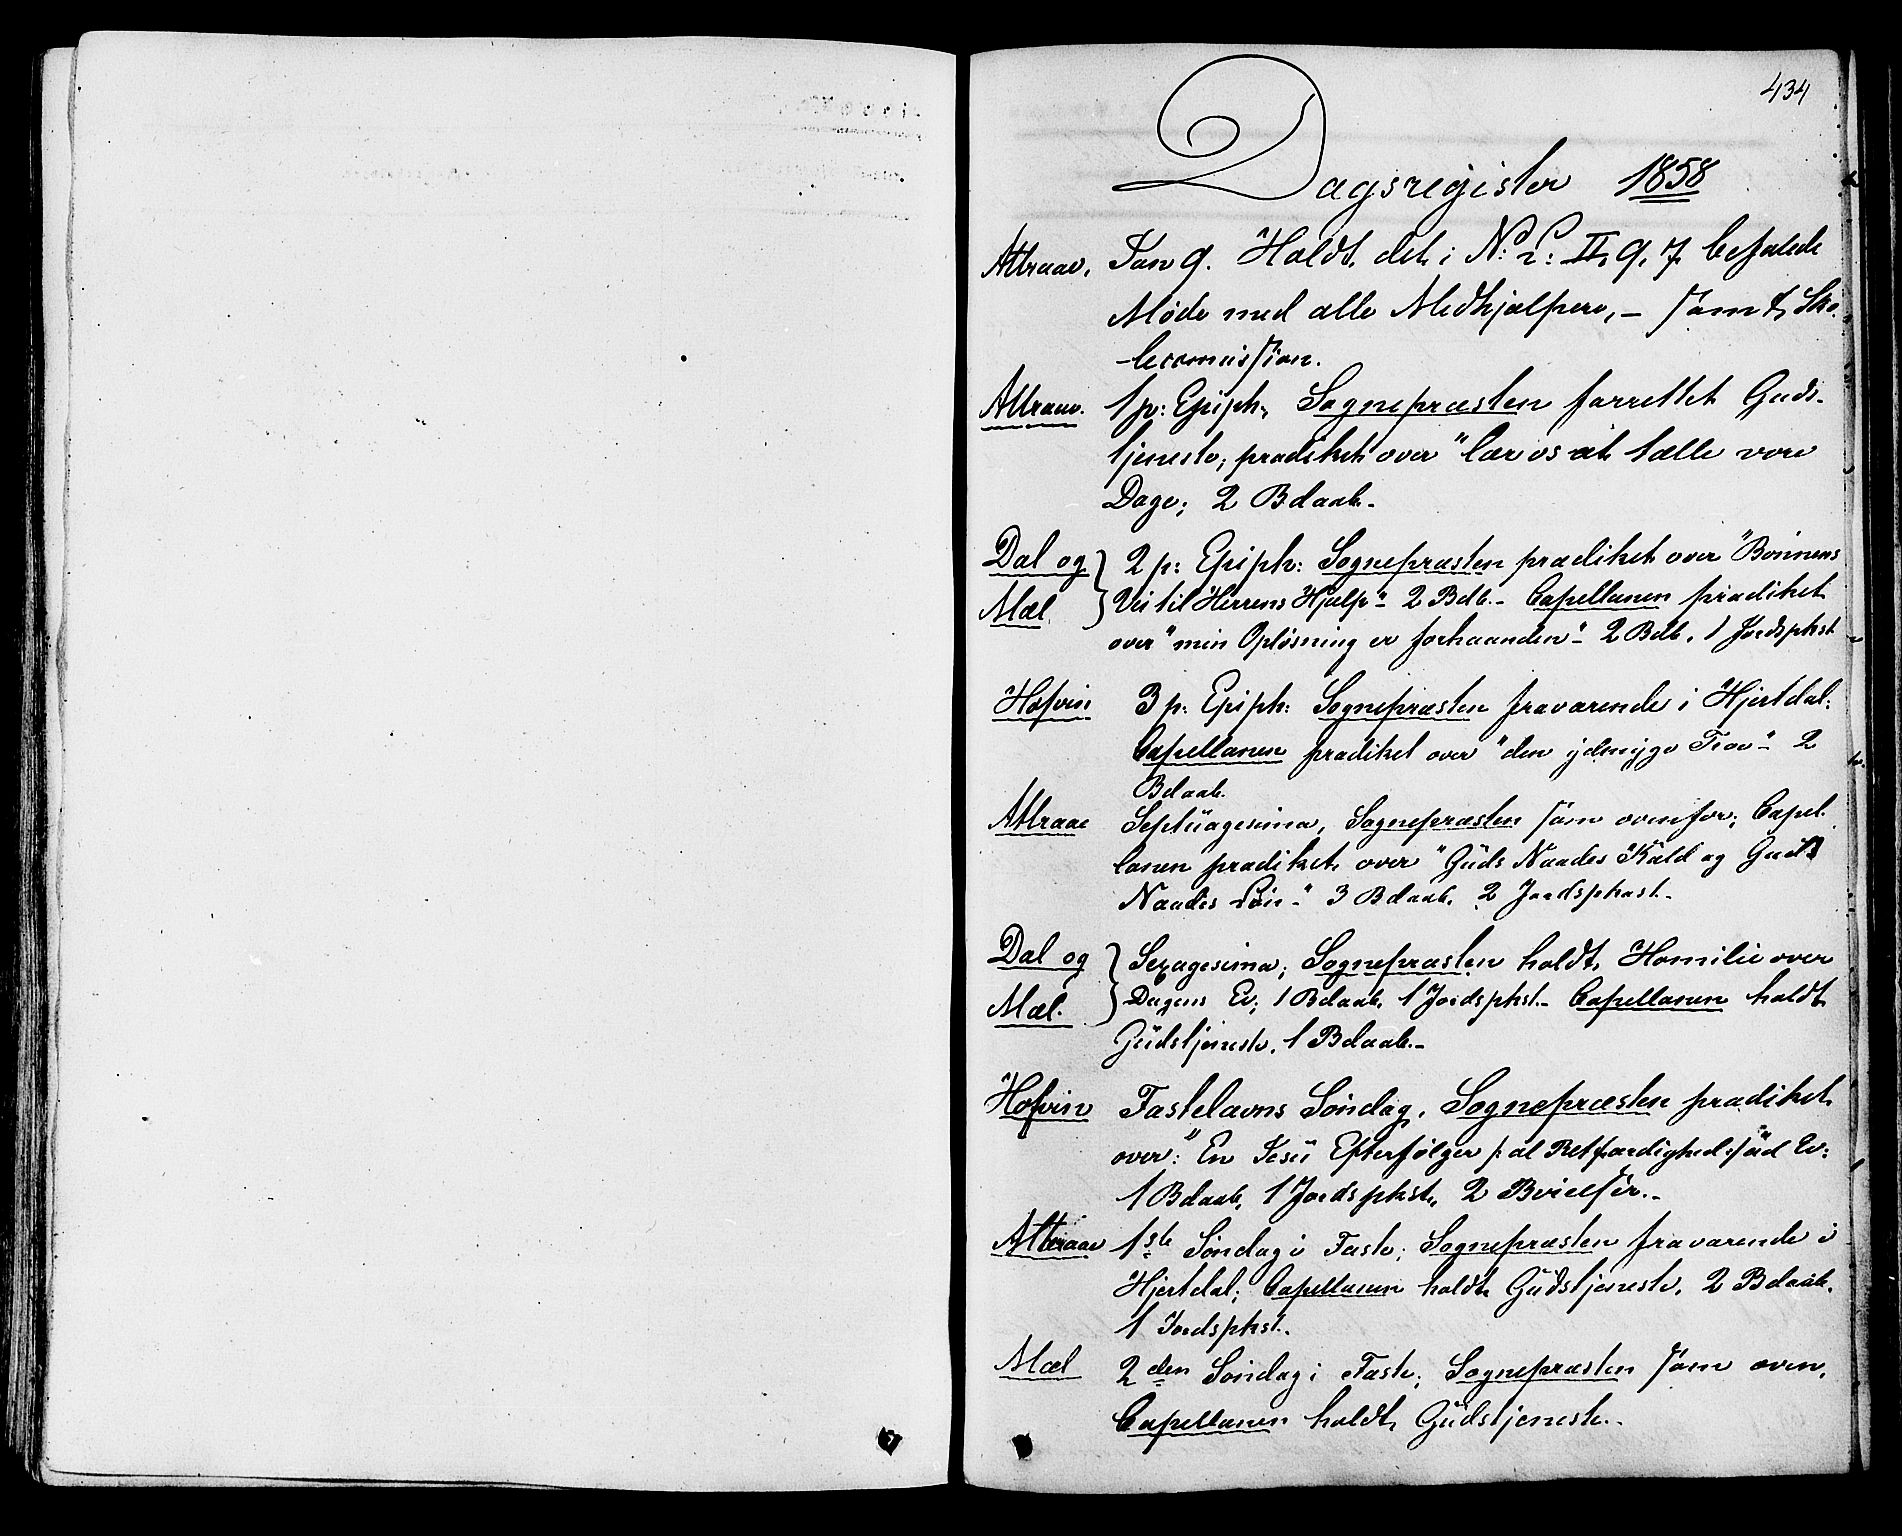 SAKO, Tinn kirkebøker, F/Fa/L0006: Ministerialbok nr. I 6, 1857-1878, s. 434